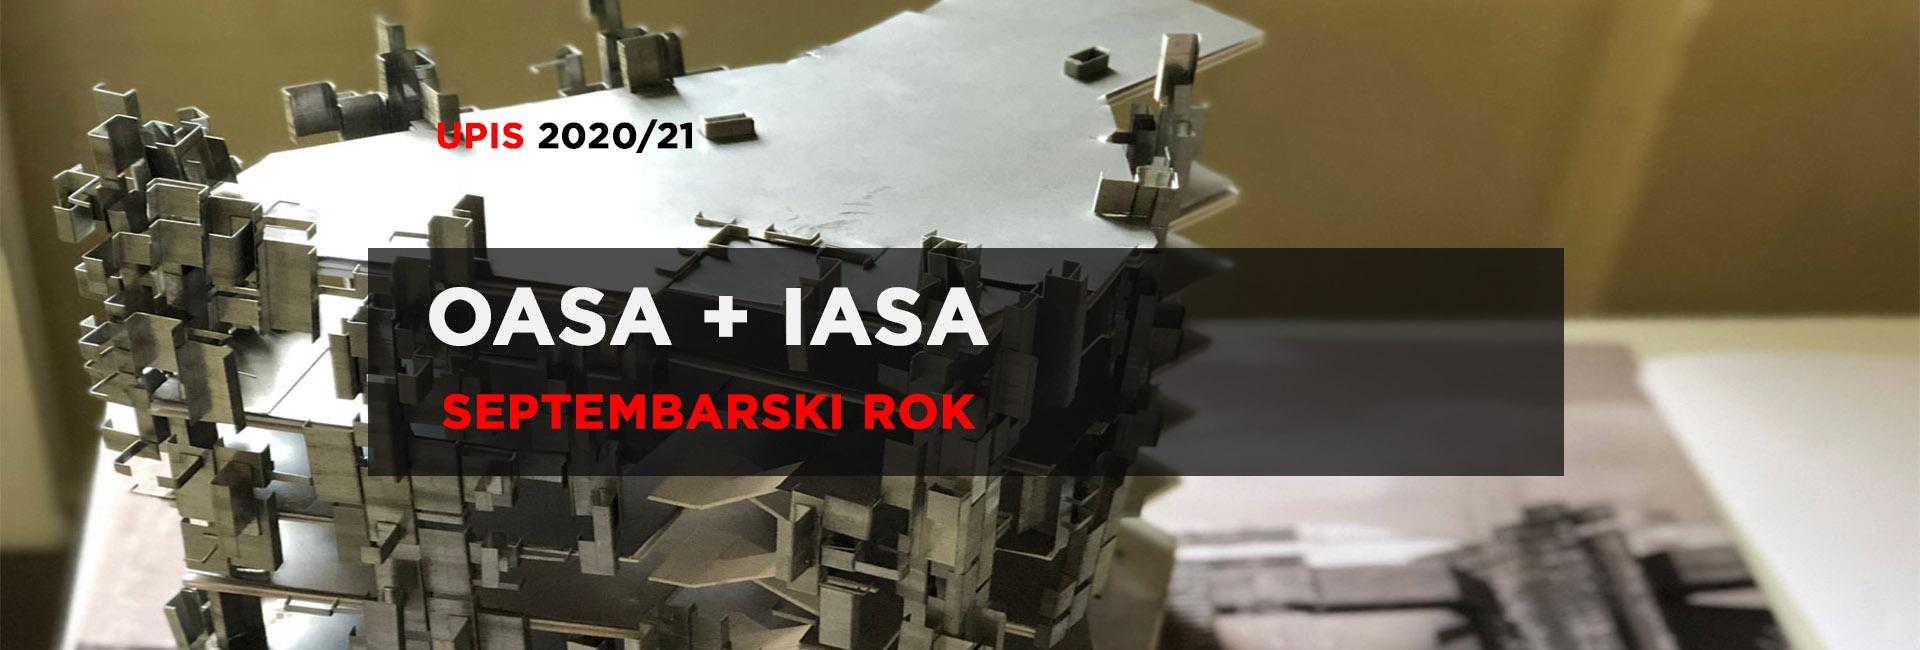 oasa iasa